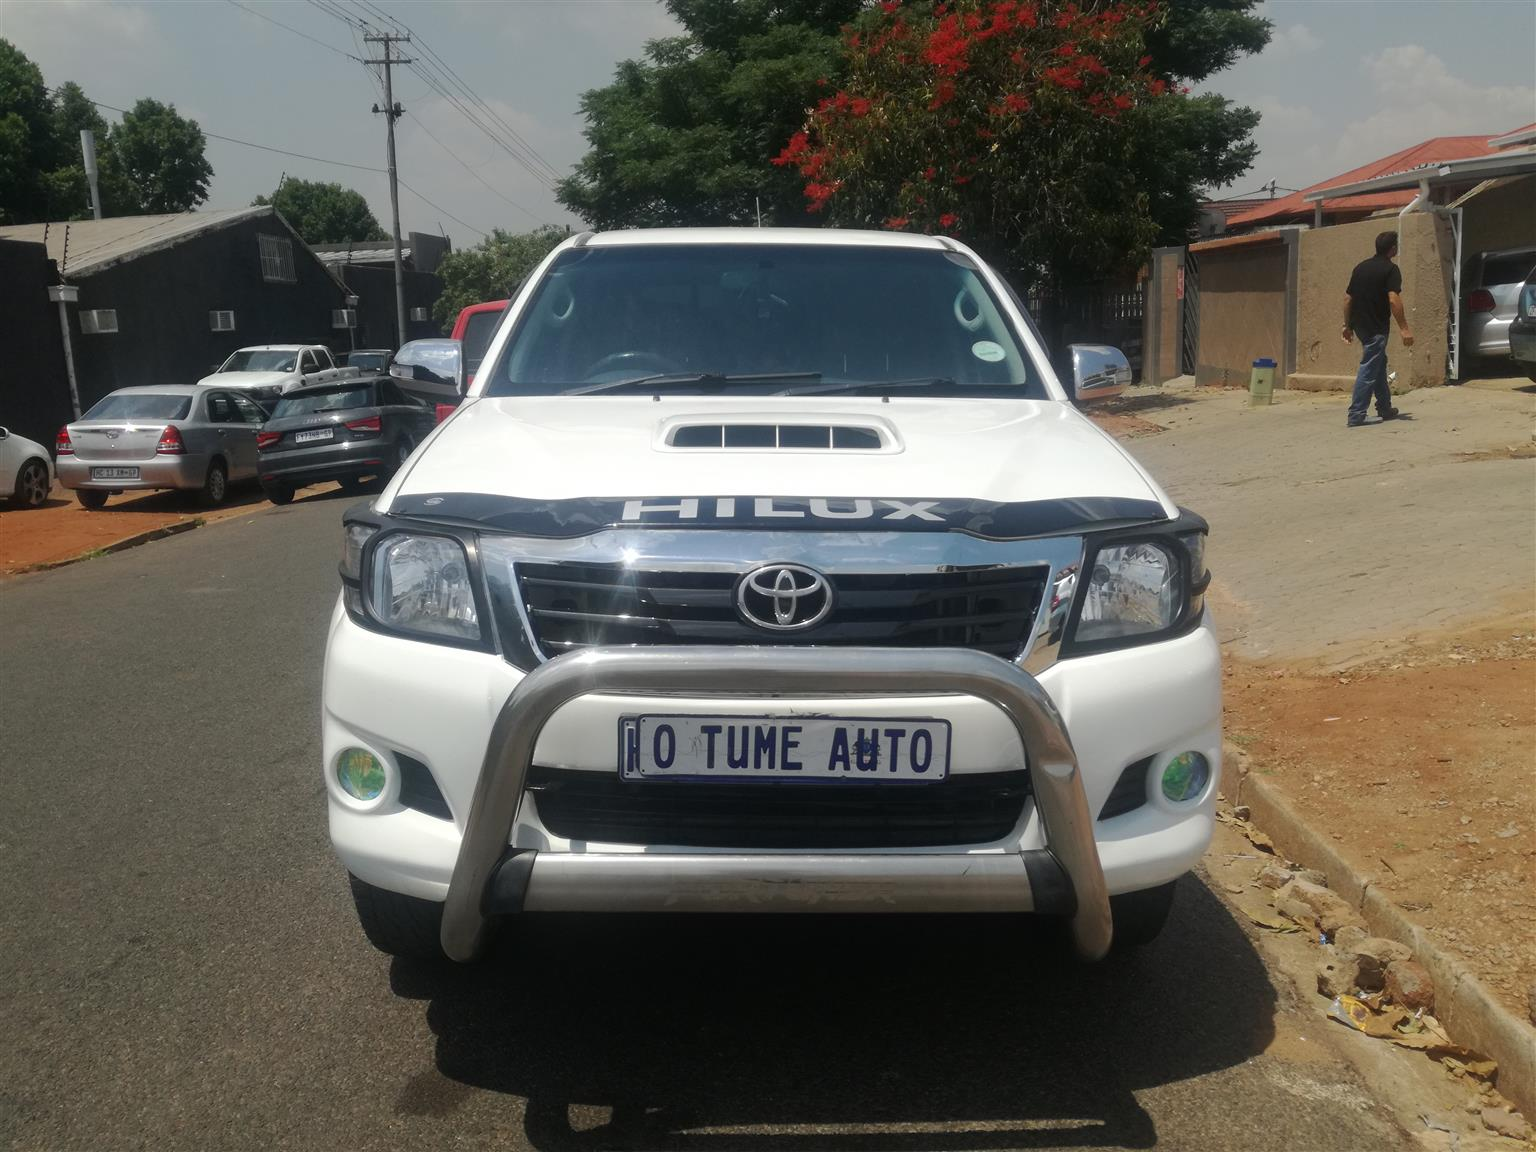 2012 Toyota Hilux 3.0D 4D Raider Dakar edition